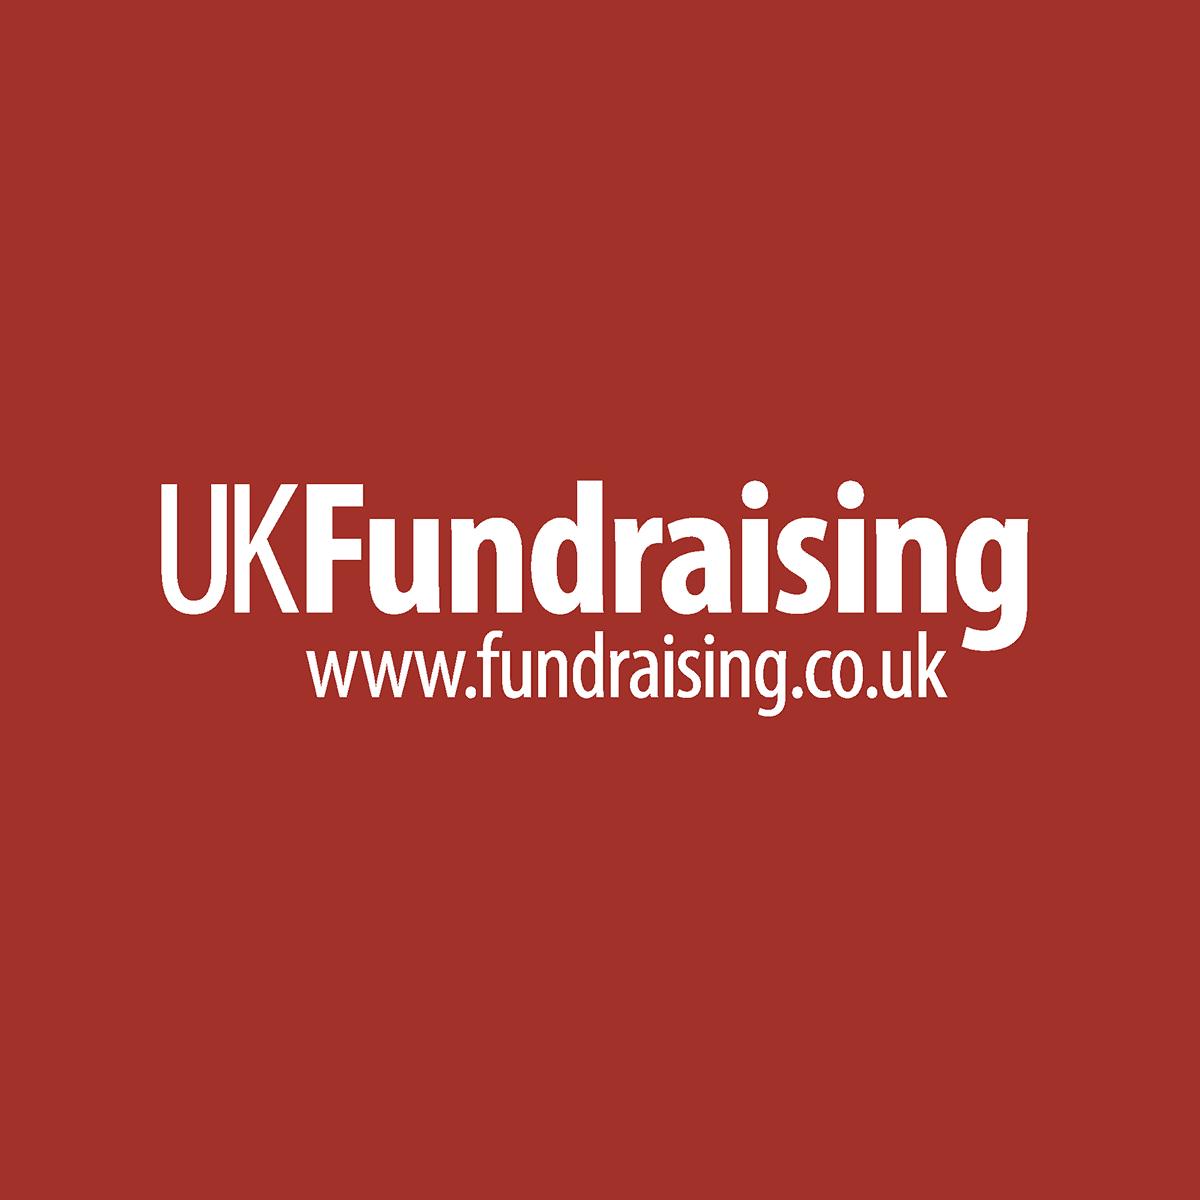 UK Fundraising covers Pimp My Cause launch Hero Image